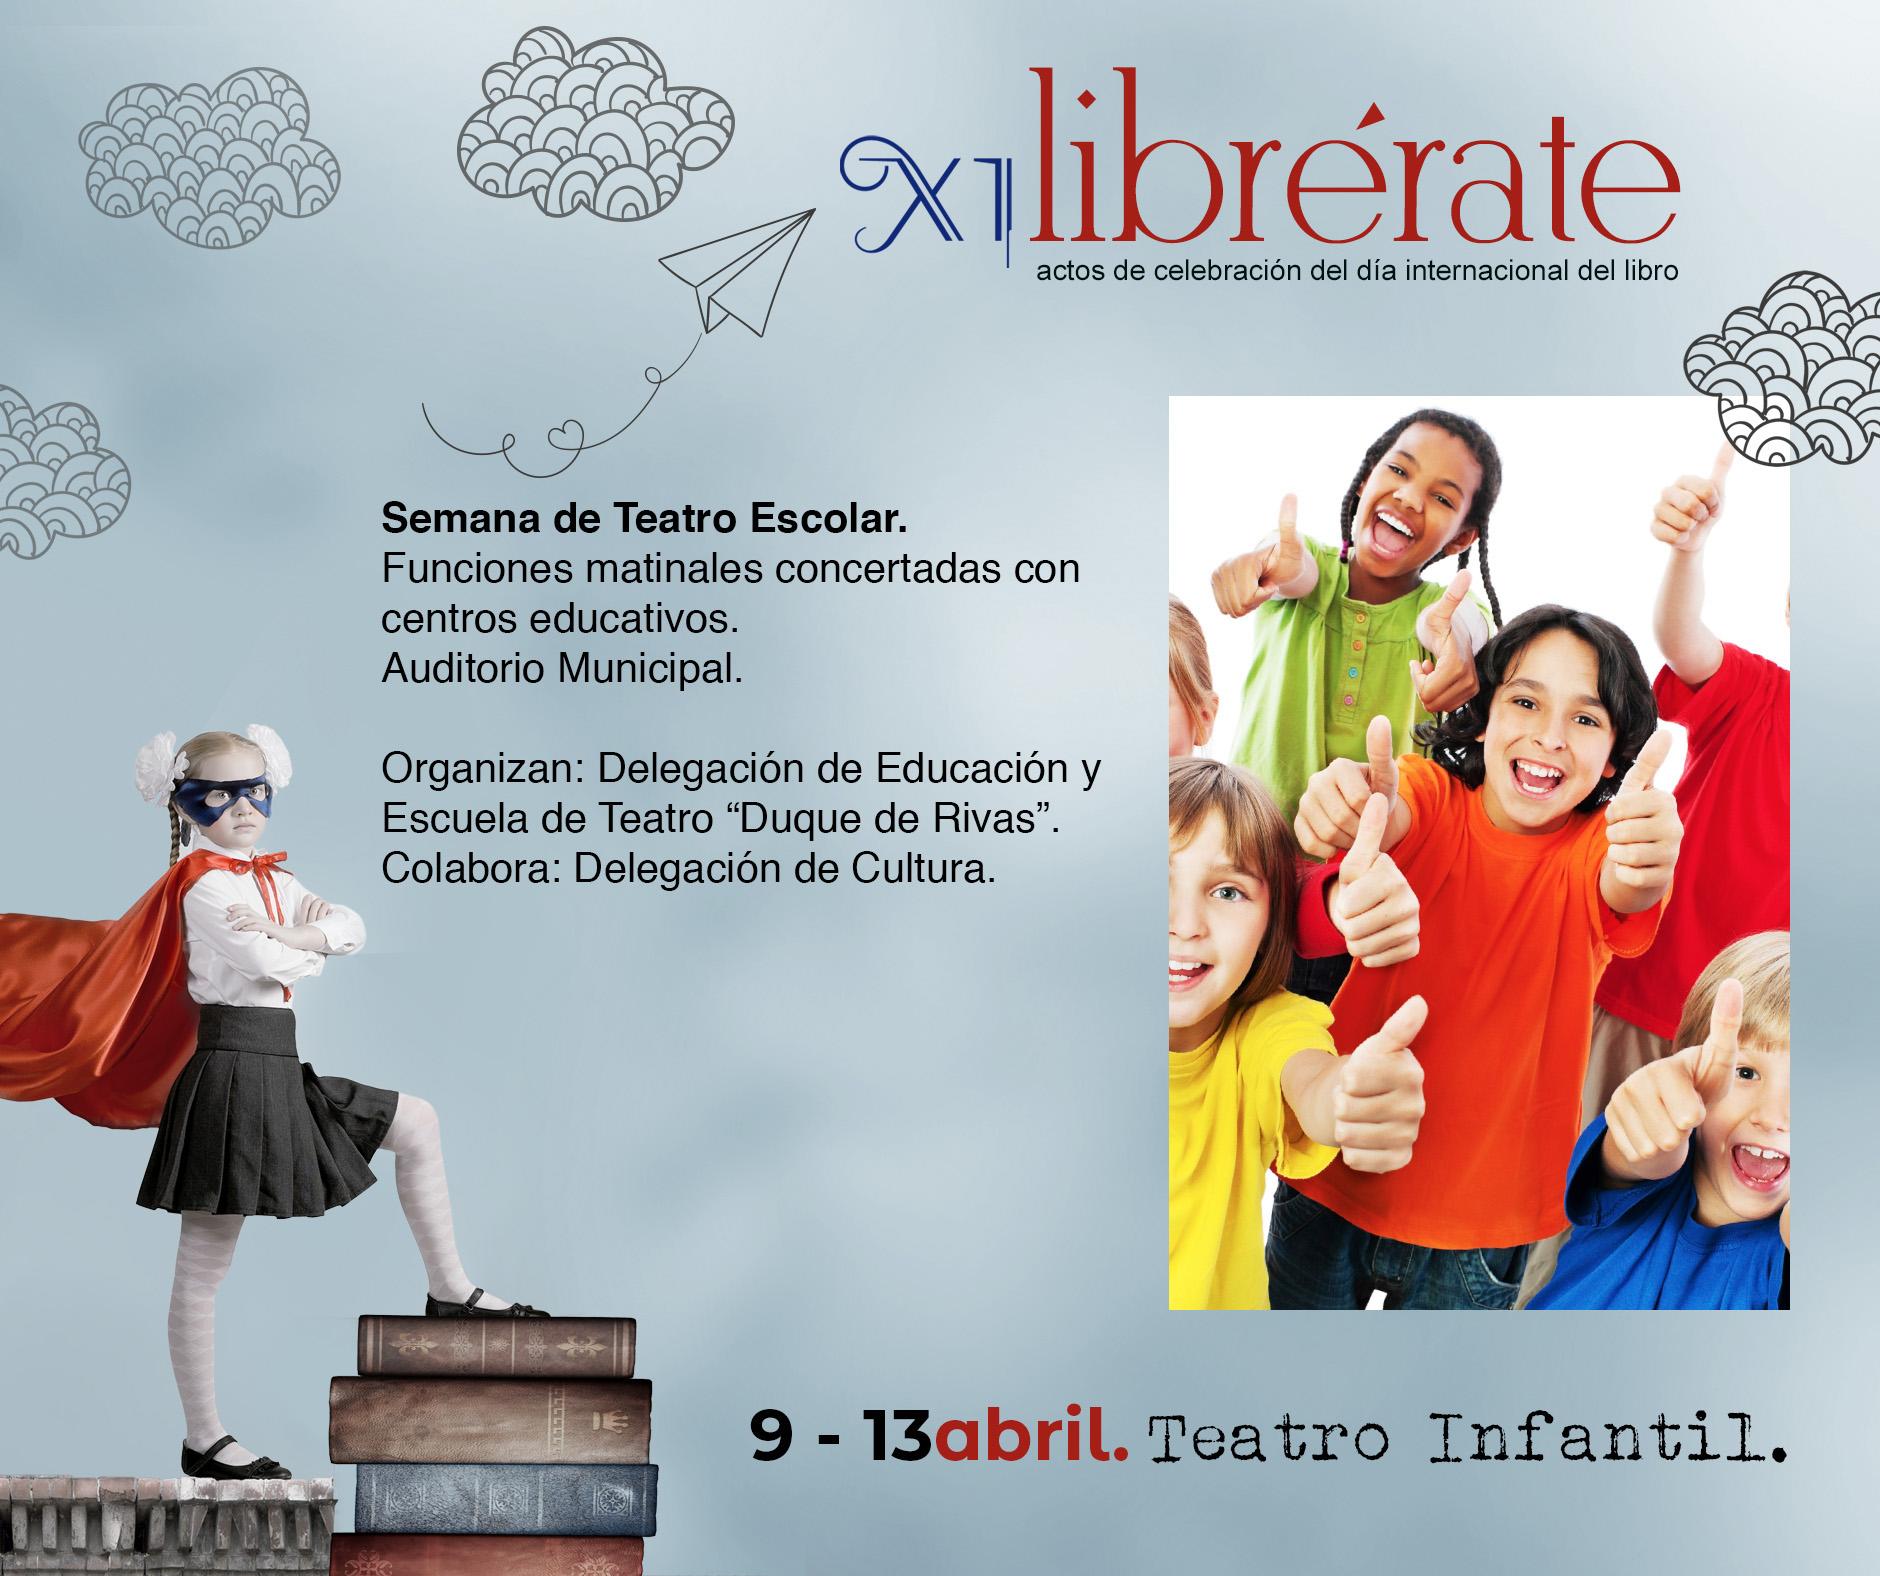 Semana de Teatro Escolar @ centros educativos